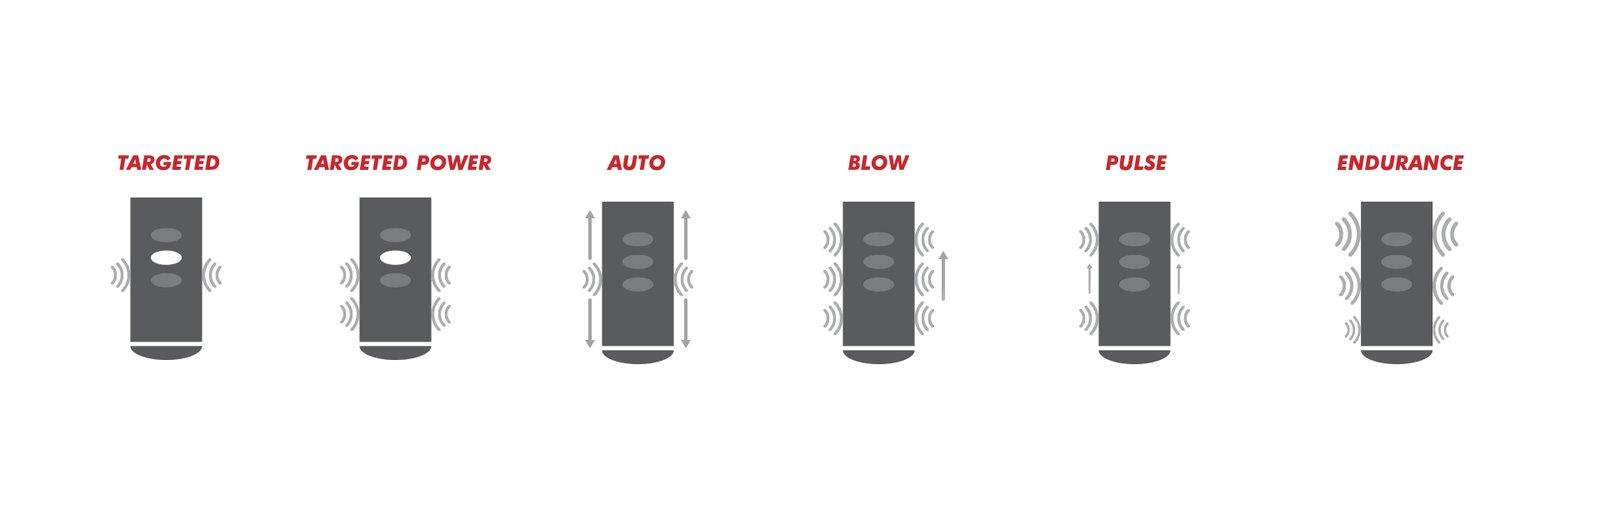 titan-kiiroo-interactive-stroker-vibrating-real-feel-sleeve-touch-sensitive-vibration-modes.jpg